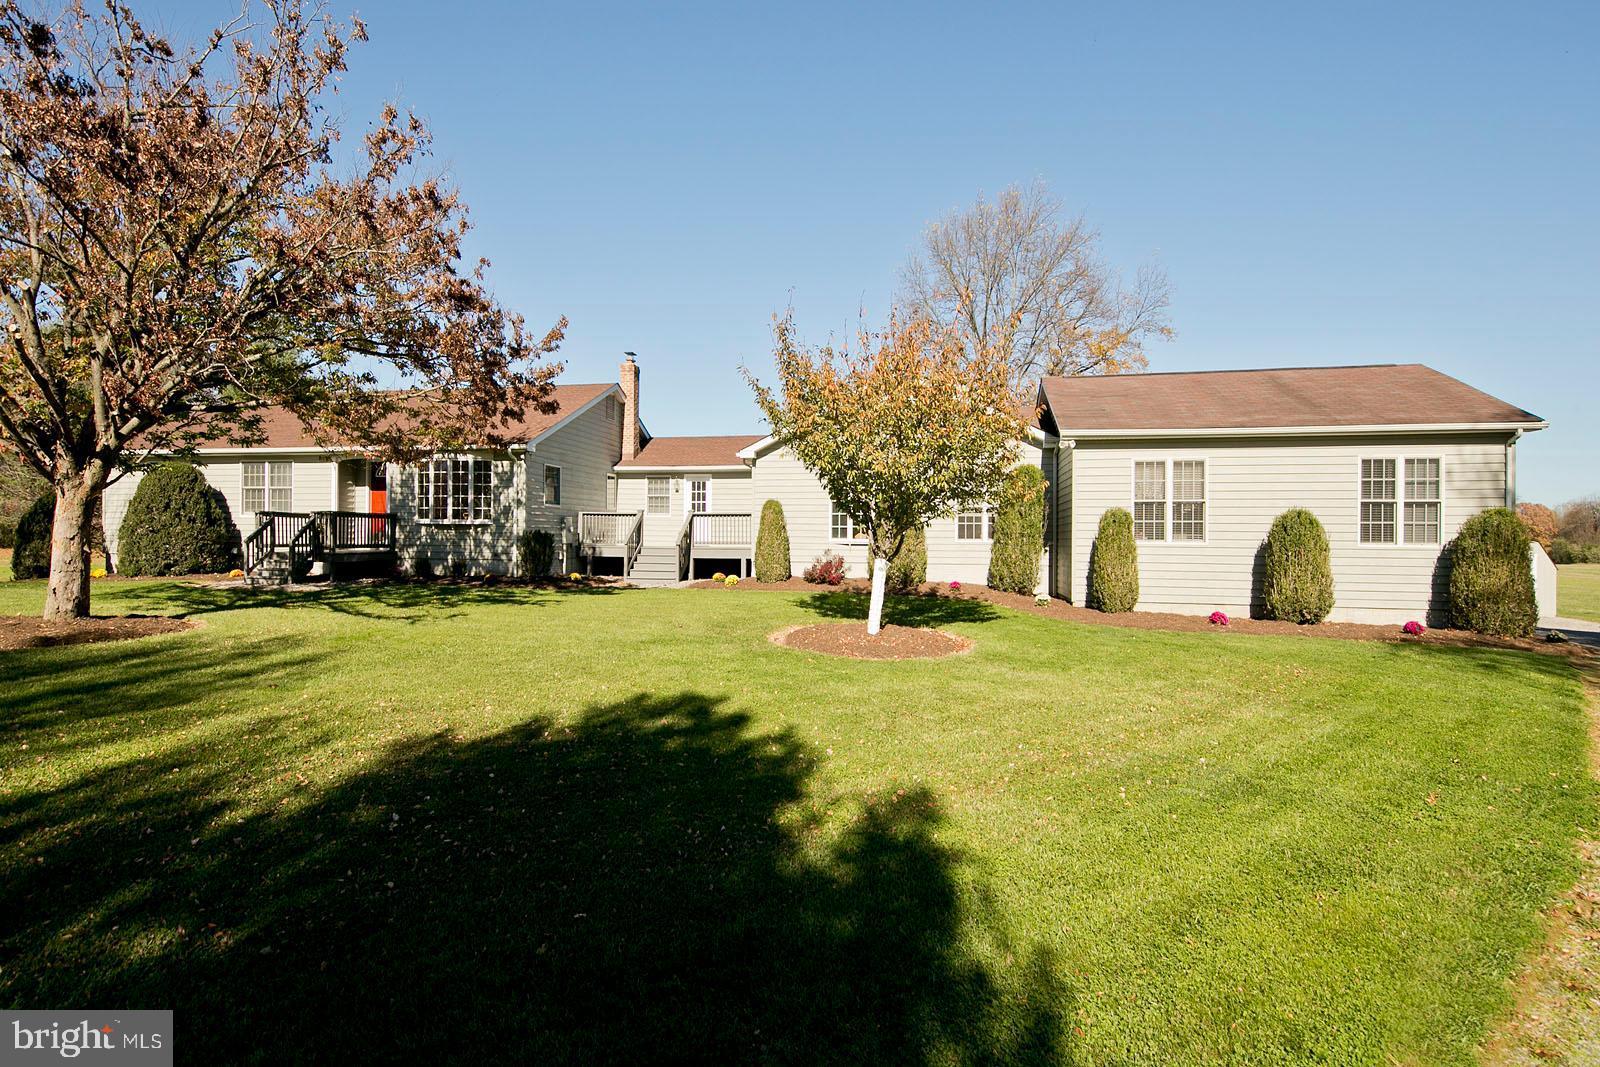 474 Ruebuck Rd, Clear Brook, VA, 22624